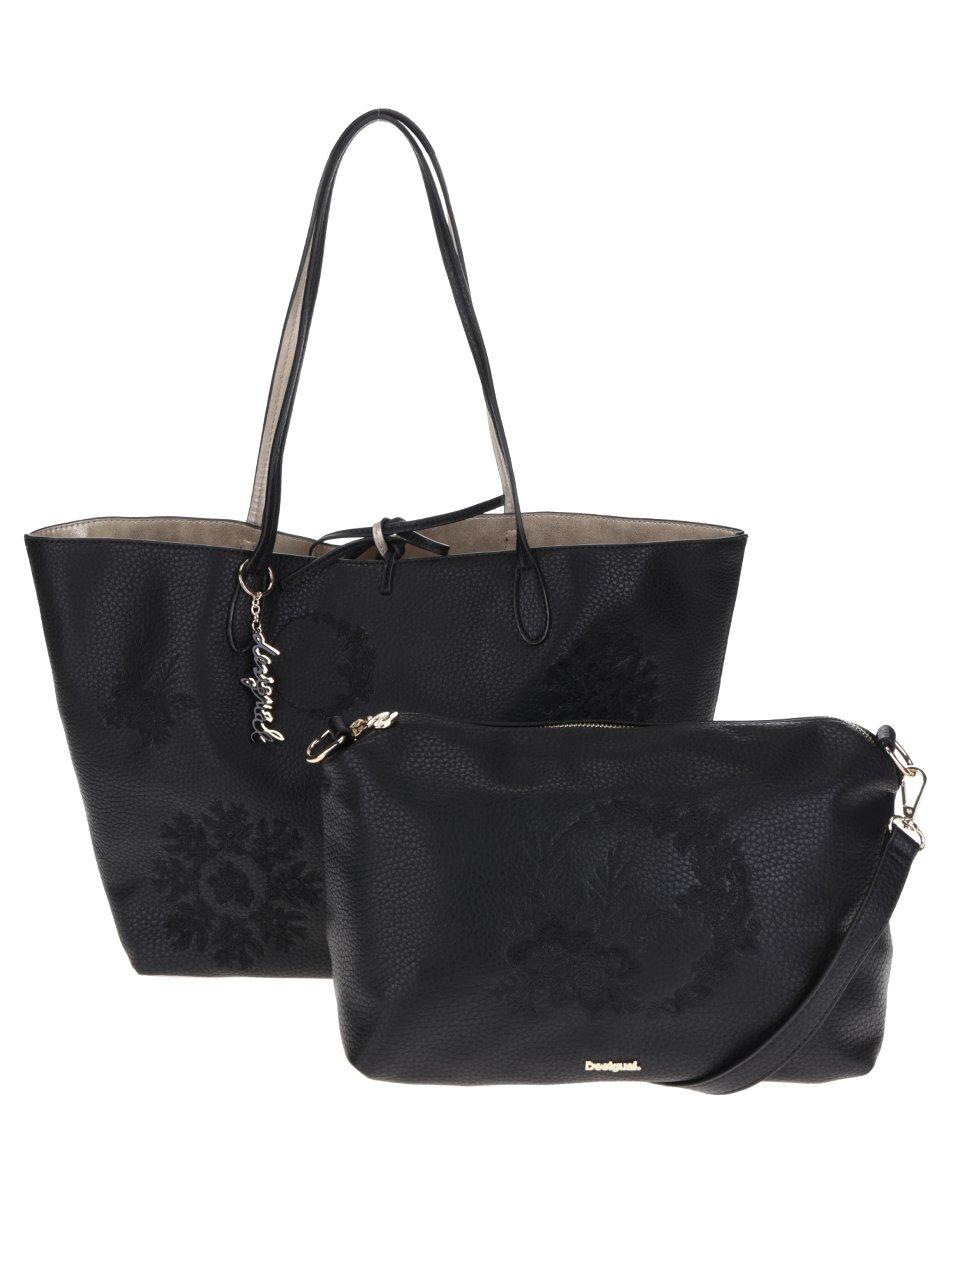 Černý oboustranný shopper s crossbody kabelkou 3v1 Desigual Capri Alice